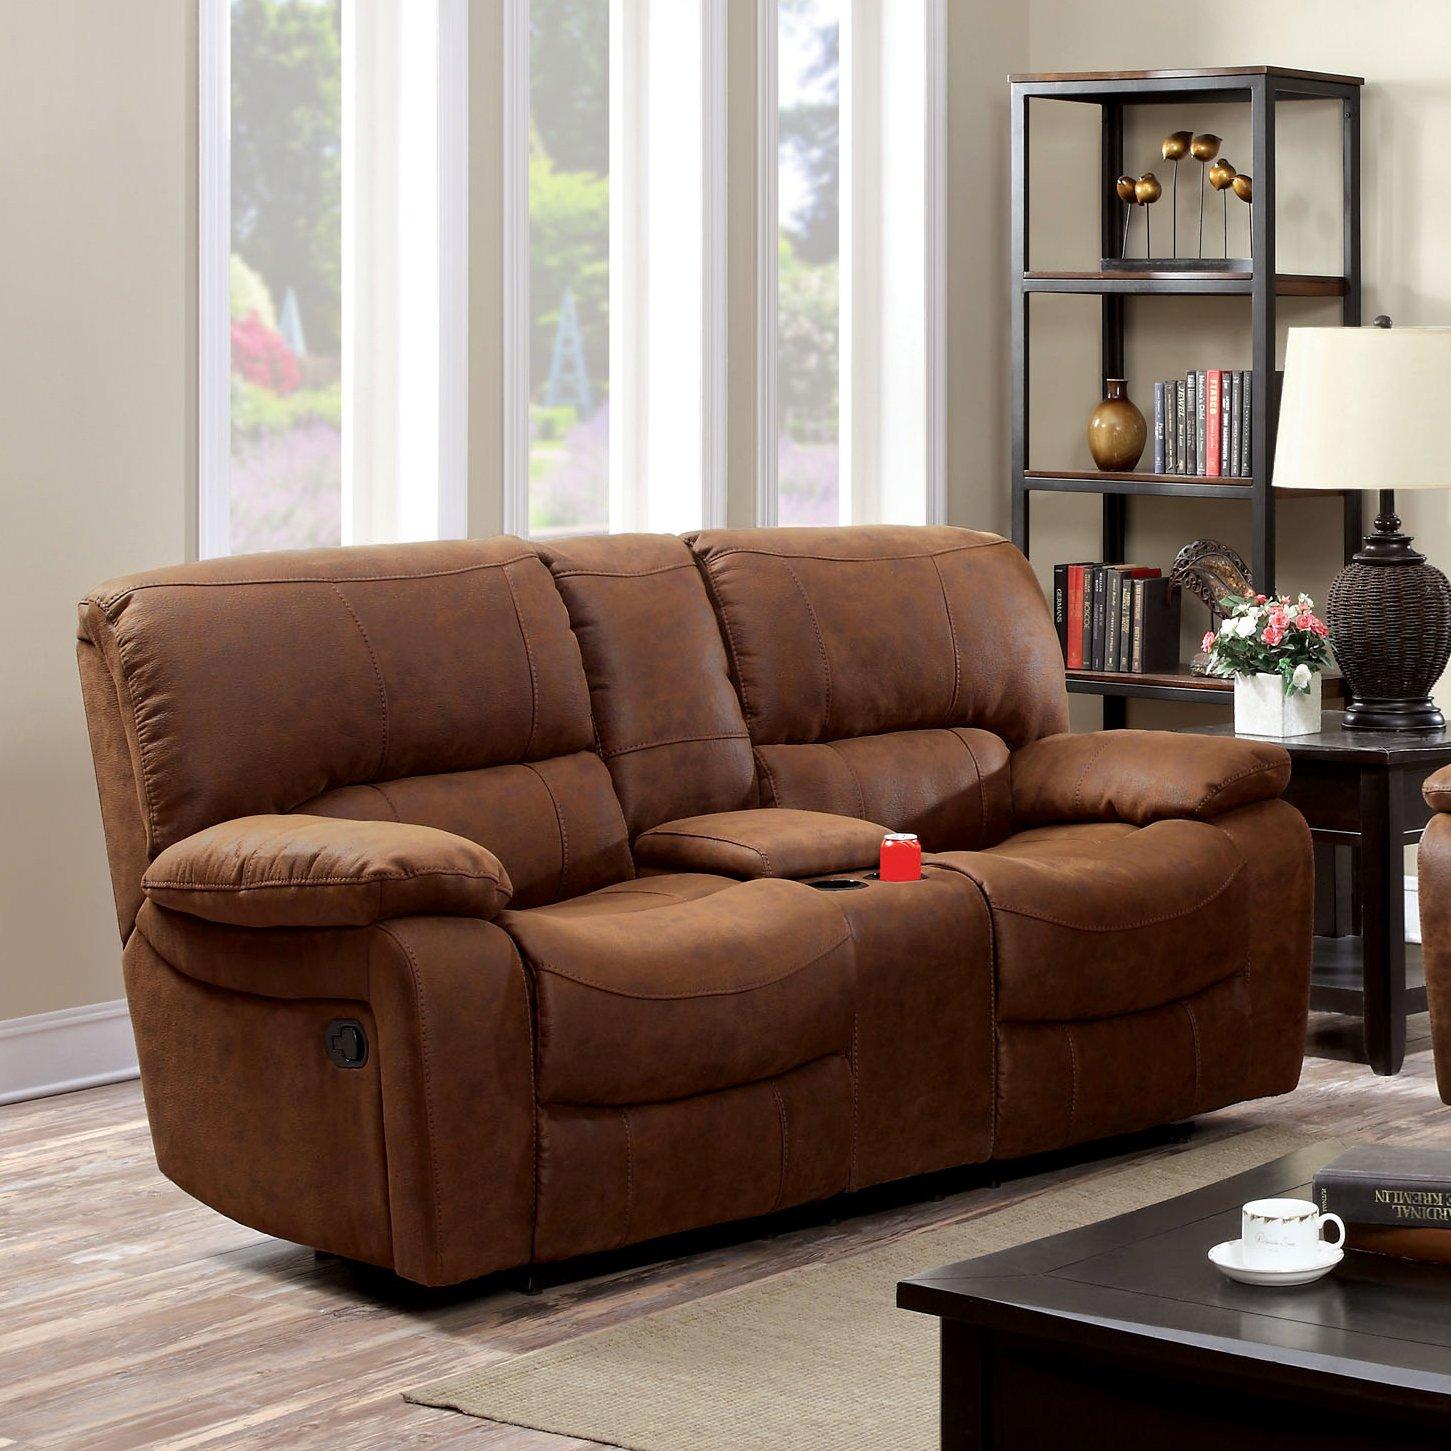 Amazon.com: Muebles de América LaFrance Sillón Reclinable ...